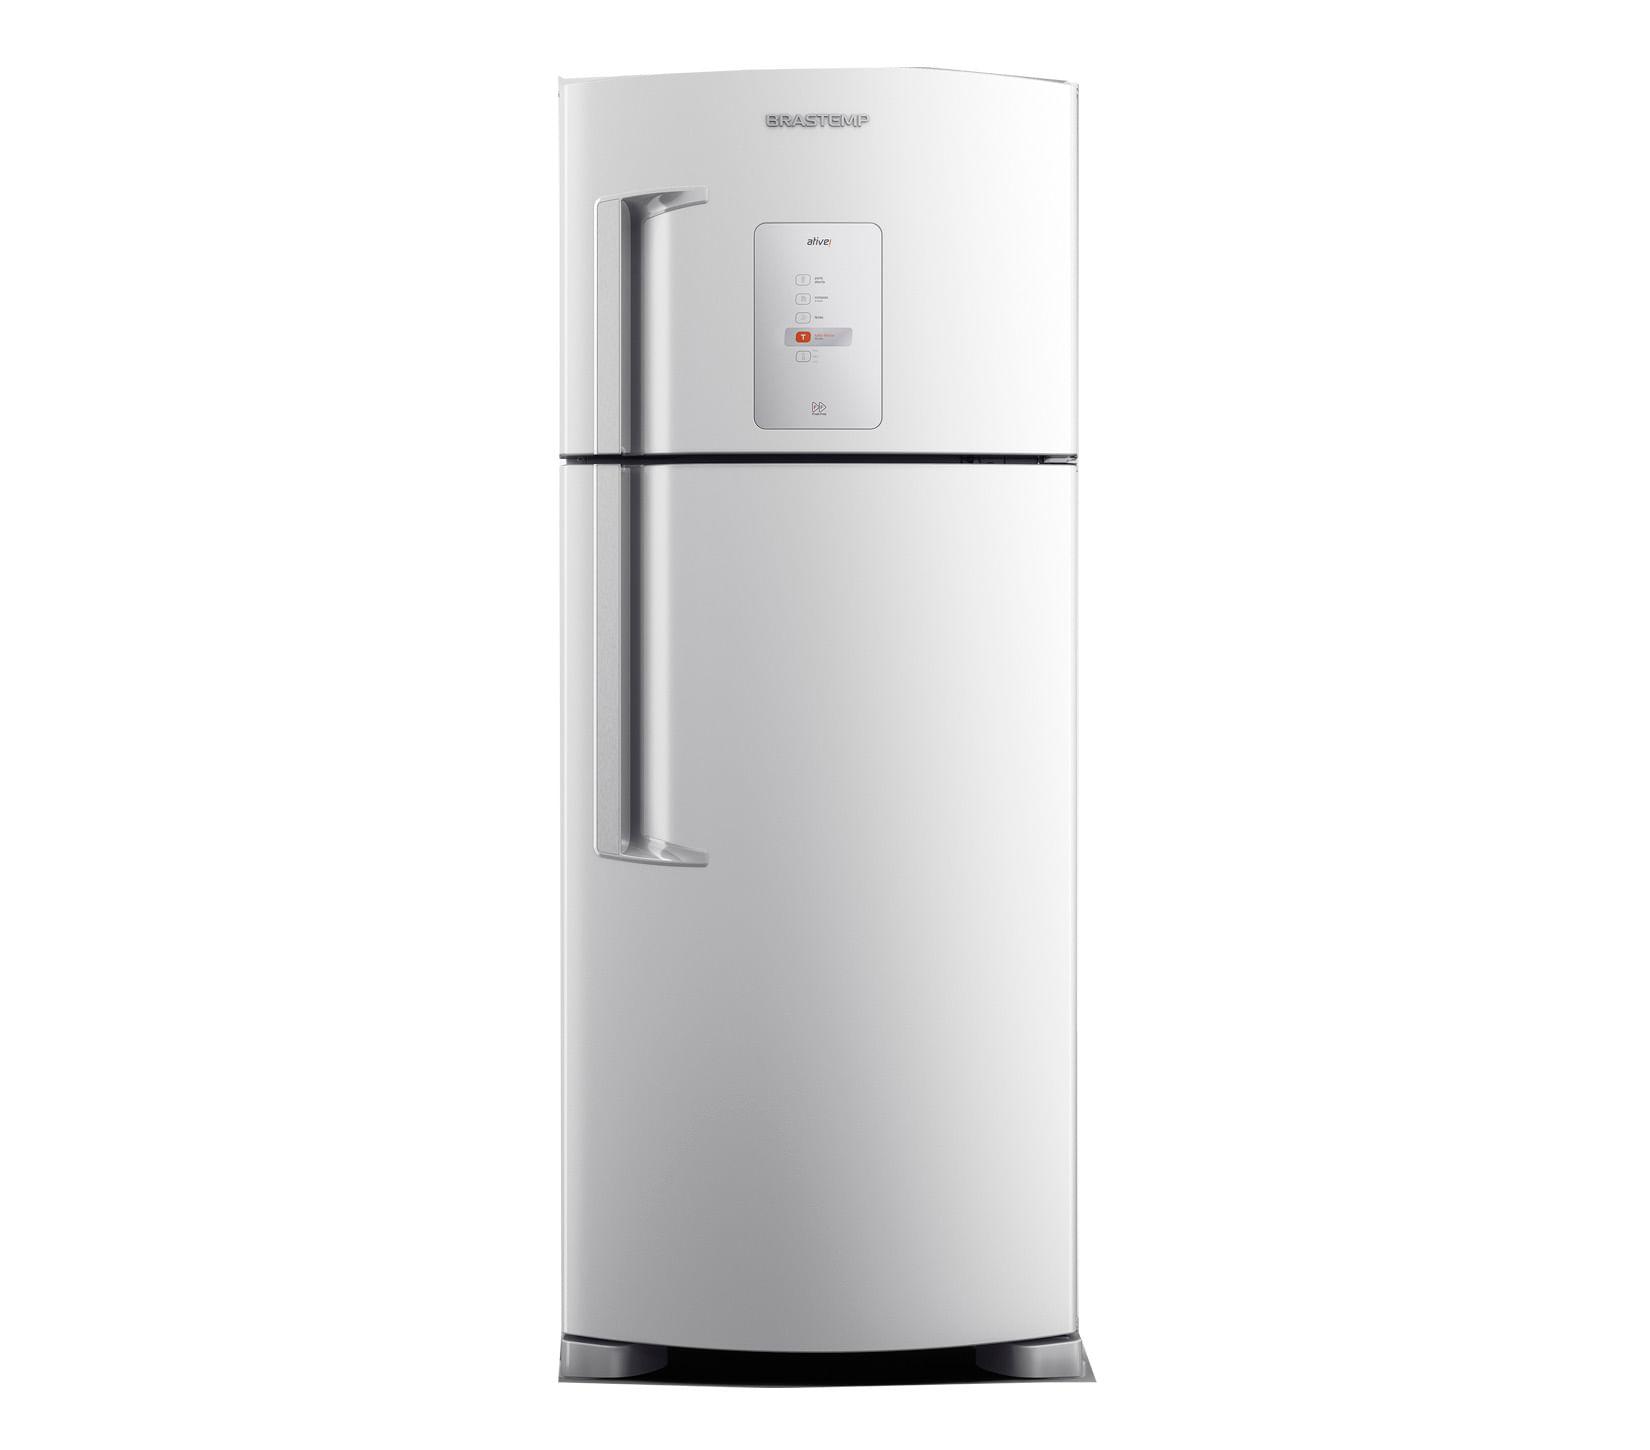 Geladeira Brastemp Frost Free Duplex 429 litros Branca com Twist Ice